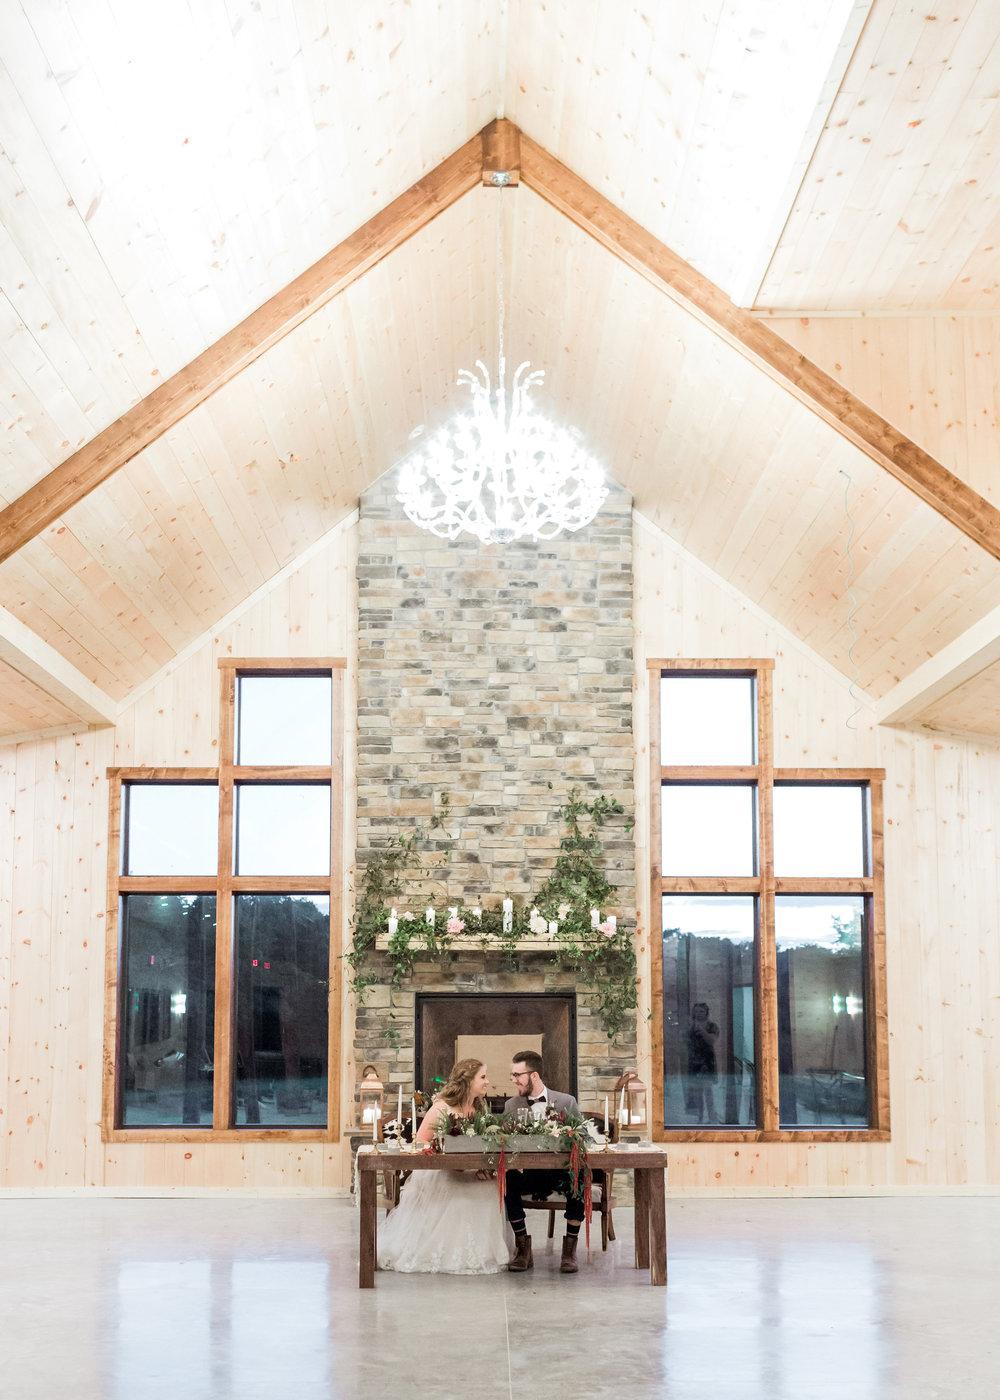 sweetheart-table-chandelier-decor-rustic-boho-reception-country-lane-lodge-adel-iowa